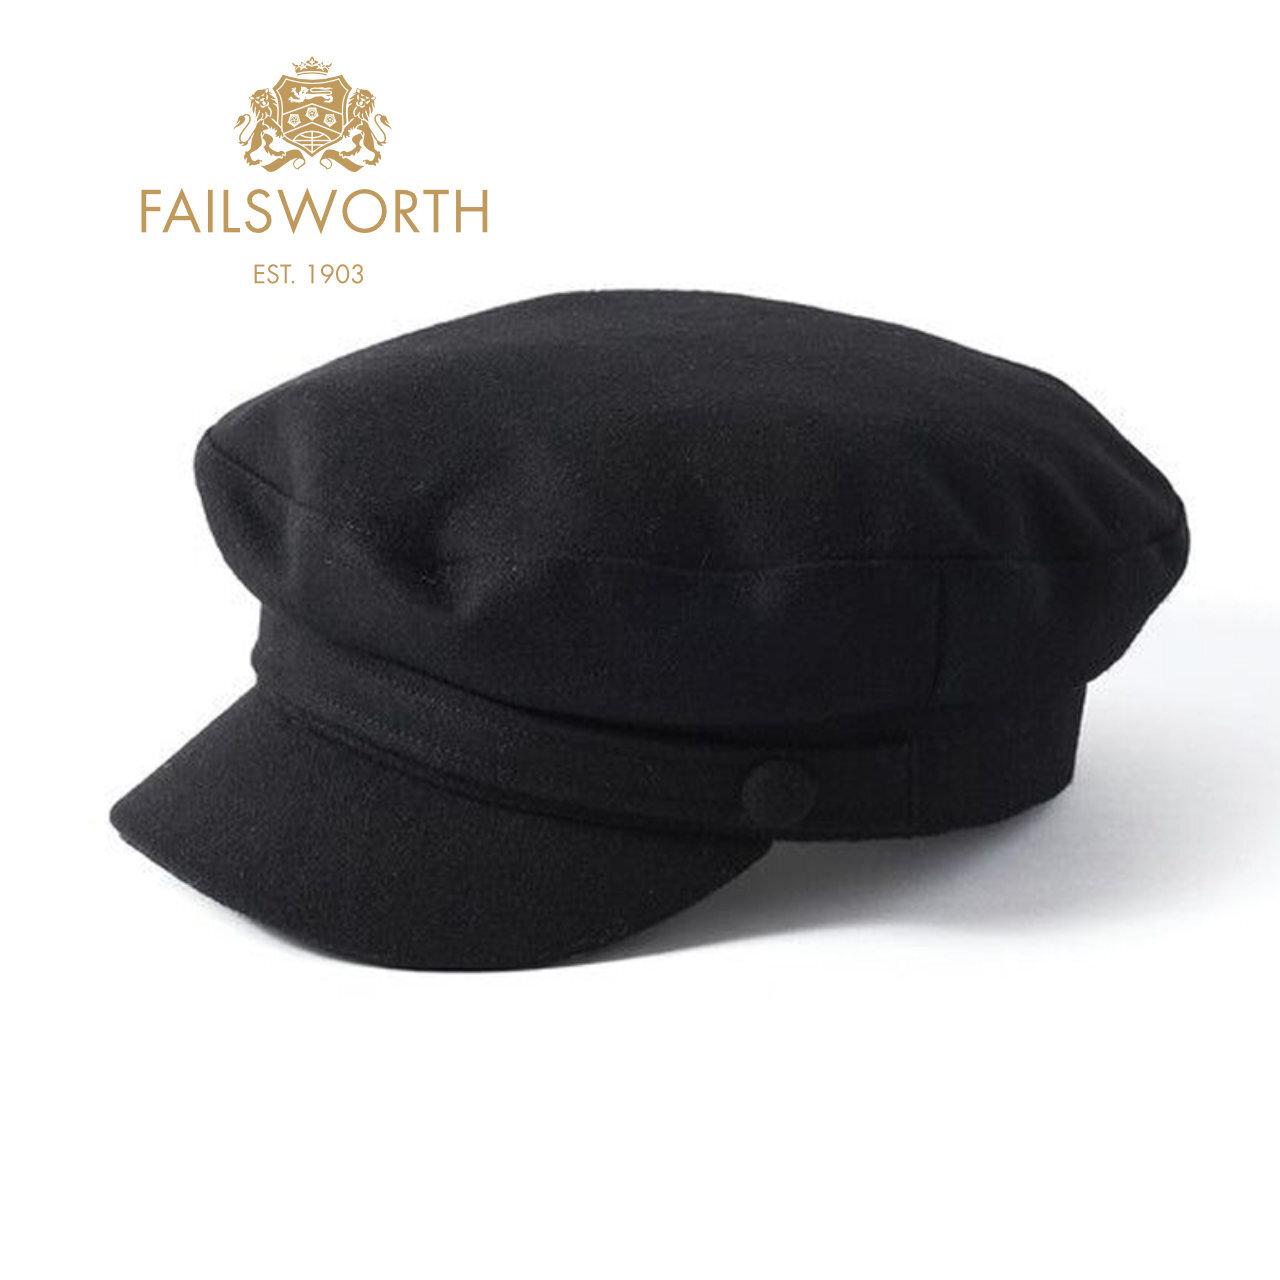 FAILSWORTH メルトン マリンキャップ / モッズキャップ 〈Black〉